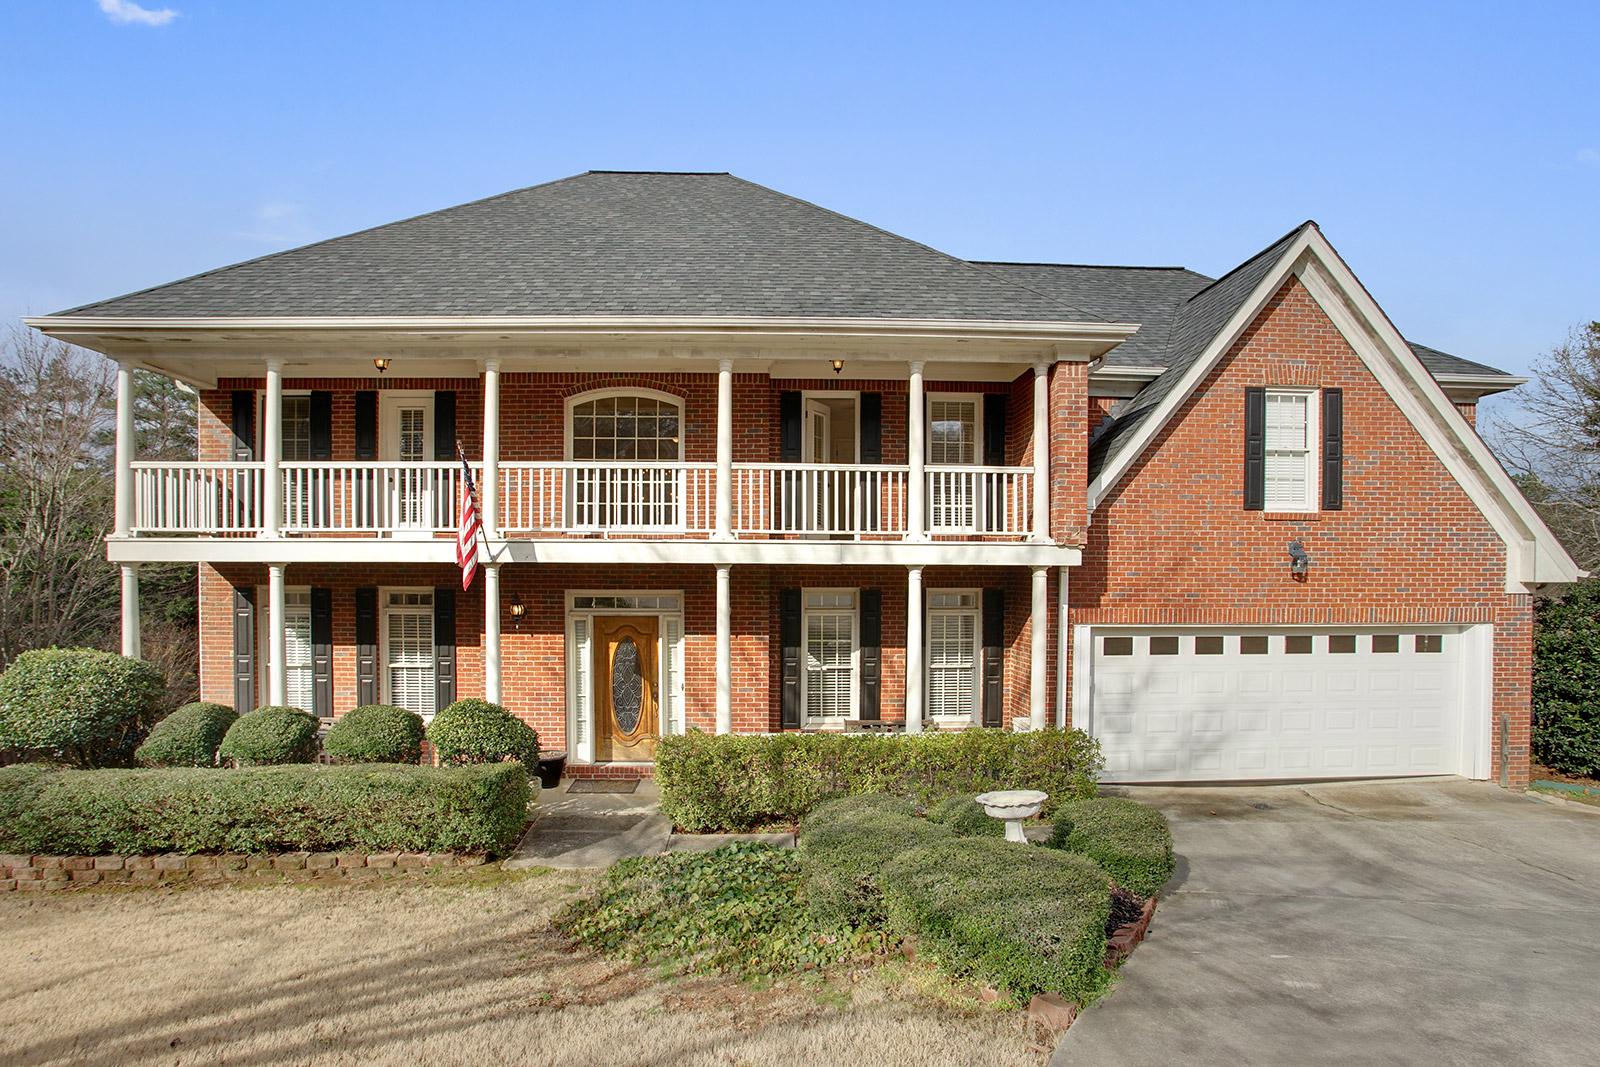 獨棟家庭住宅 為 出售 在 Brick Traditional With Balcony 2085 Park Glenn Drive Alpharetta, 喬治亞州, 30005 美國